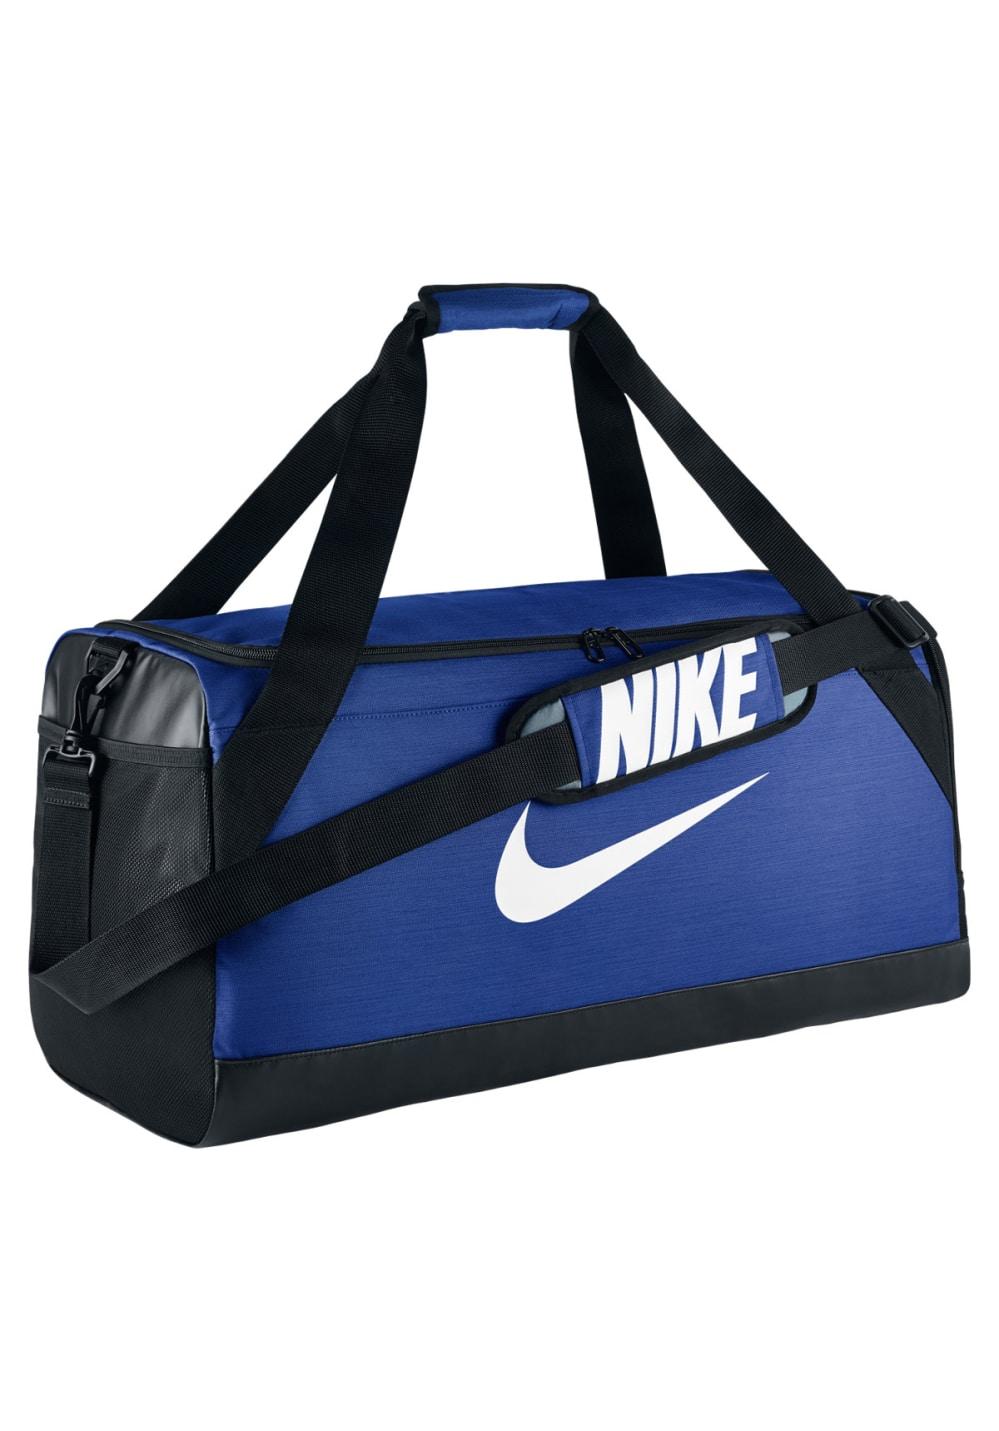 Nike Brasilia Medium Training Duffel Bag - Sporttaschen für Herren - Blau